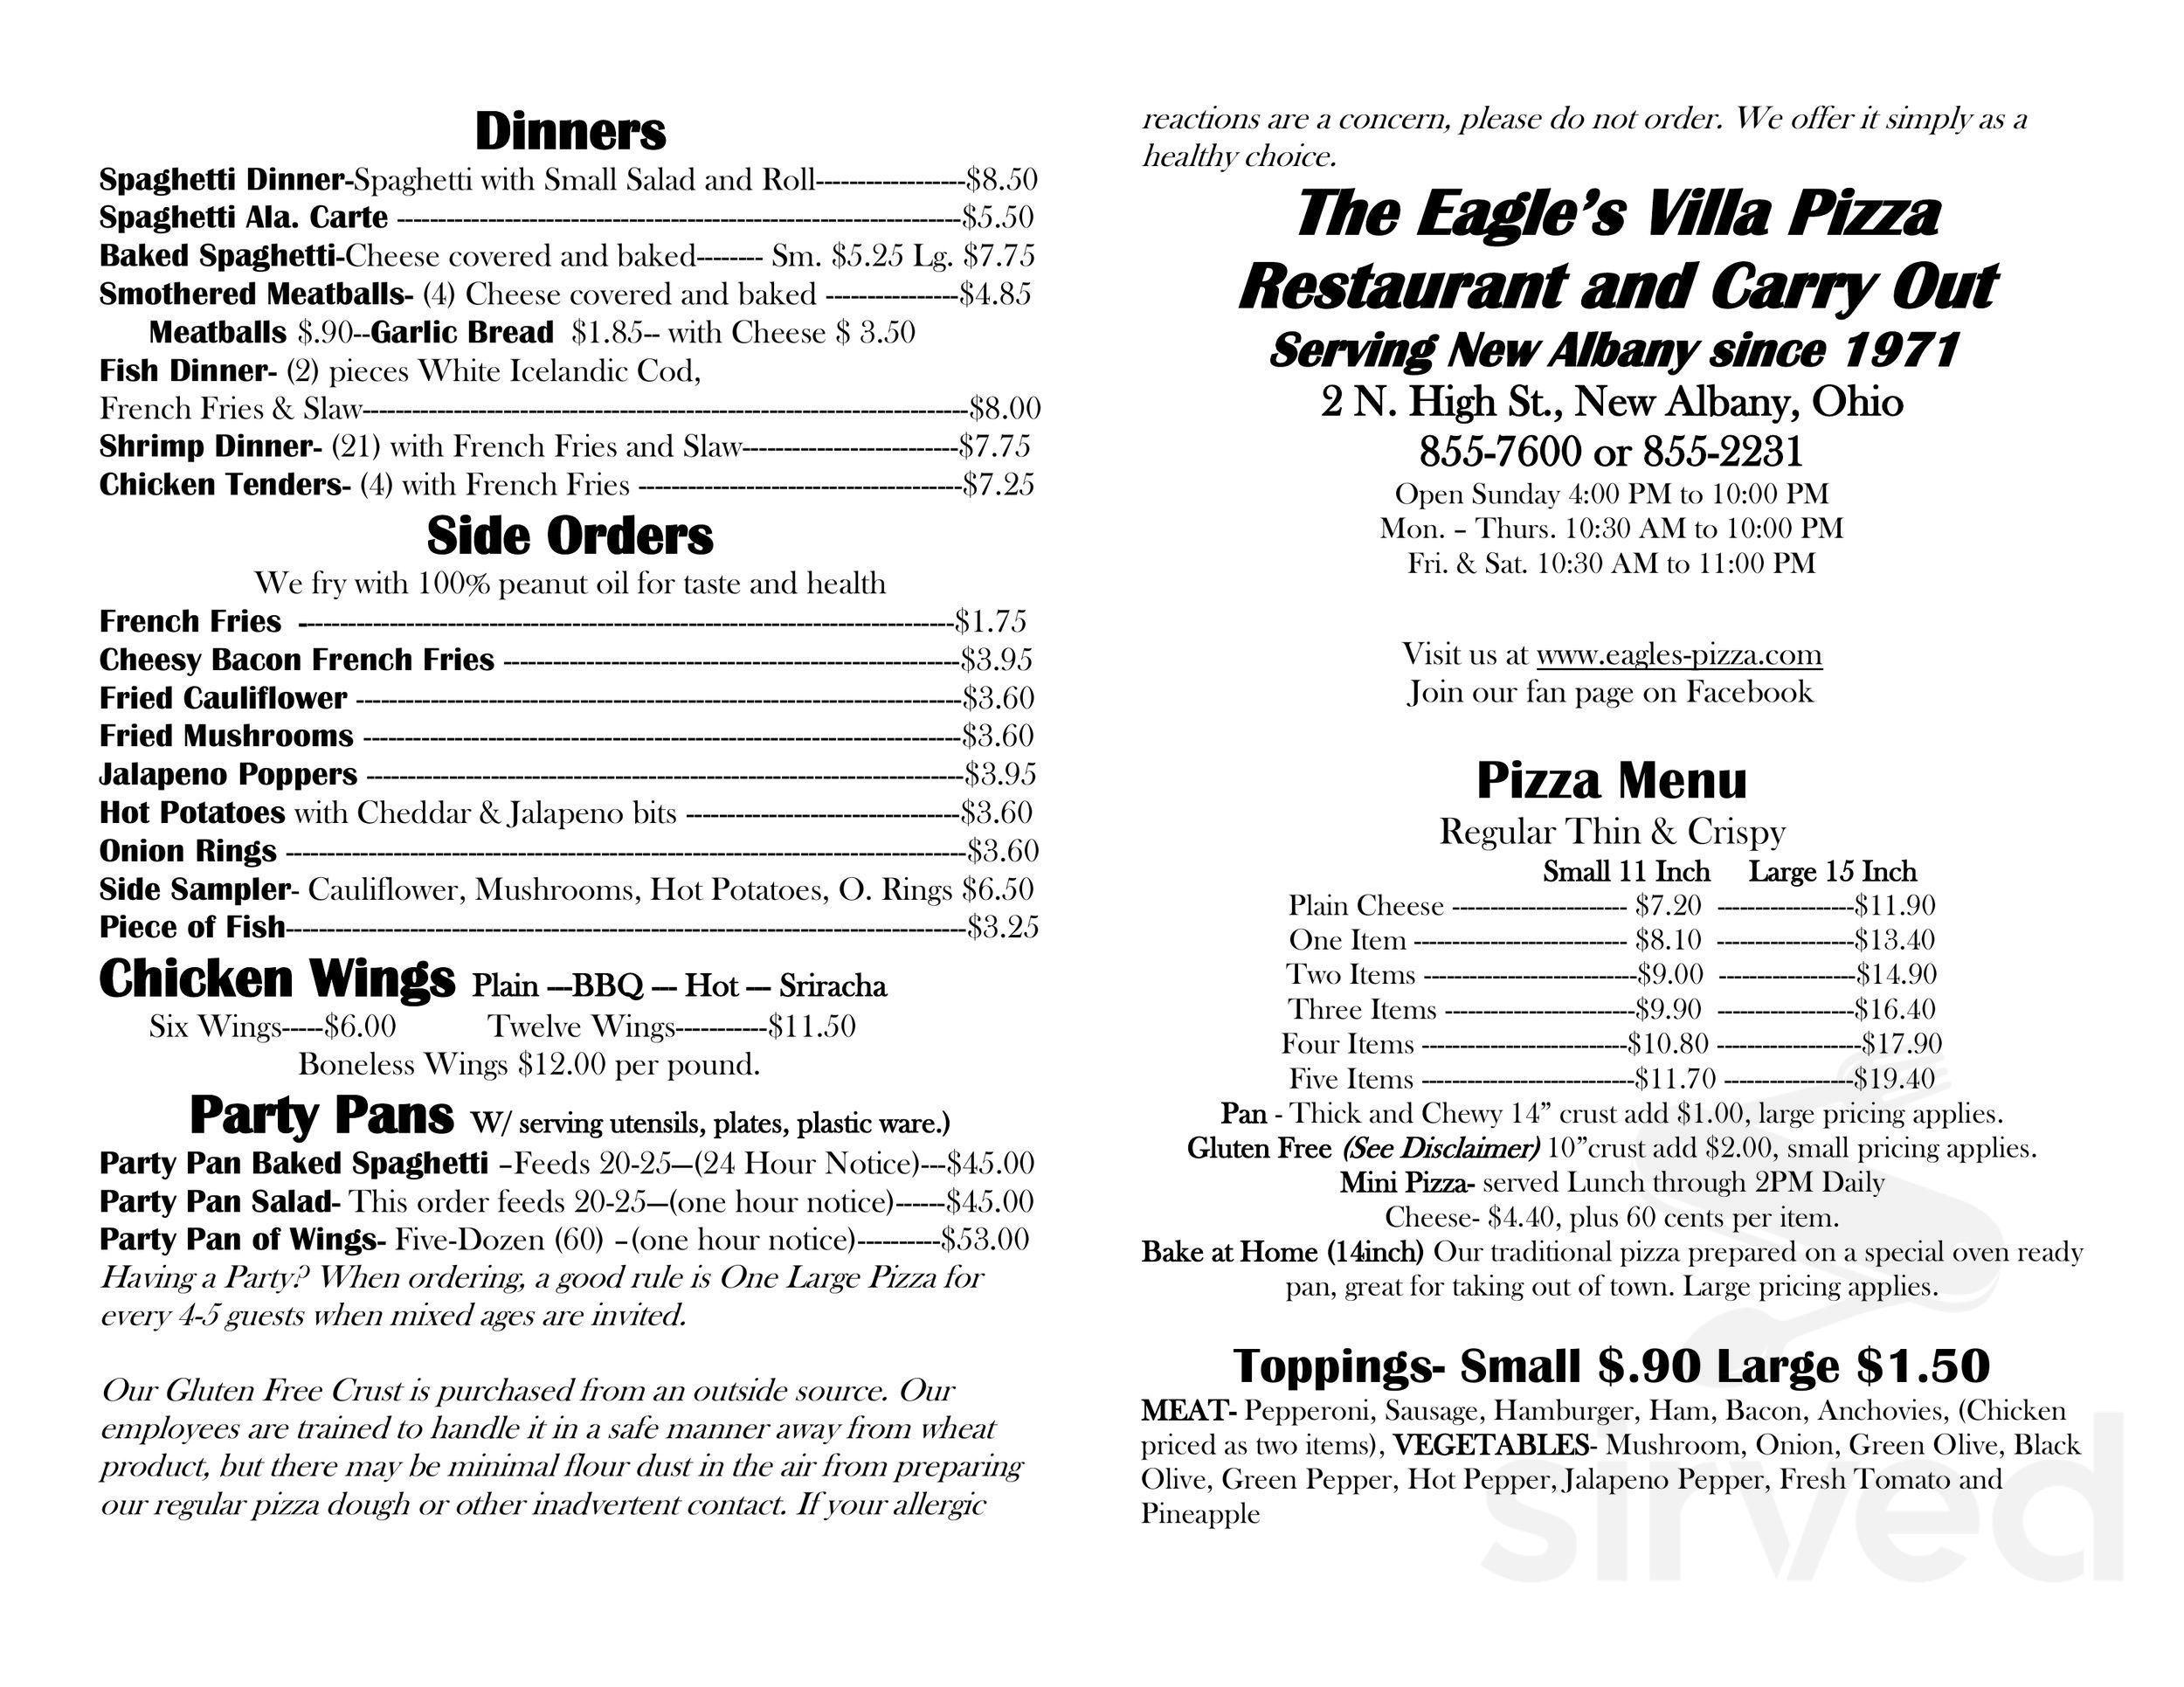 Menu For Eagles Pizza In New Albany Ohio Usa